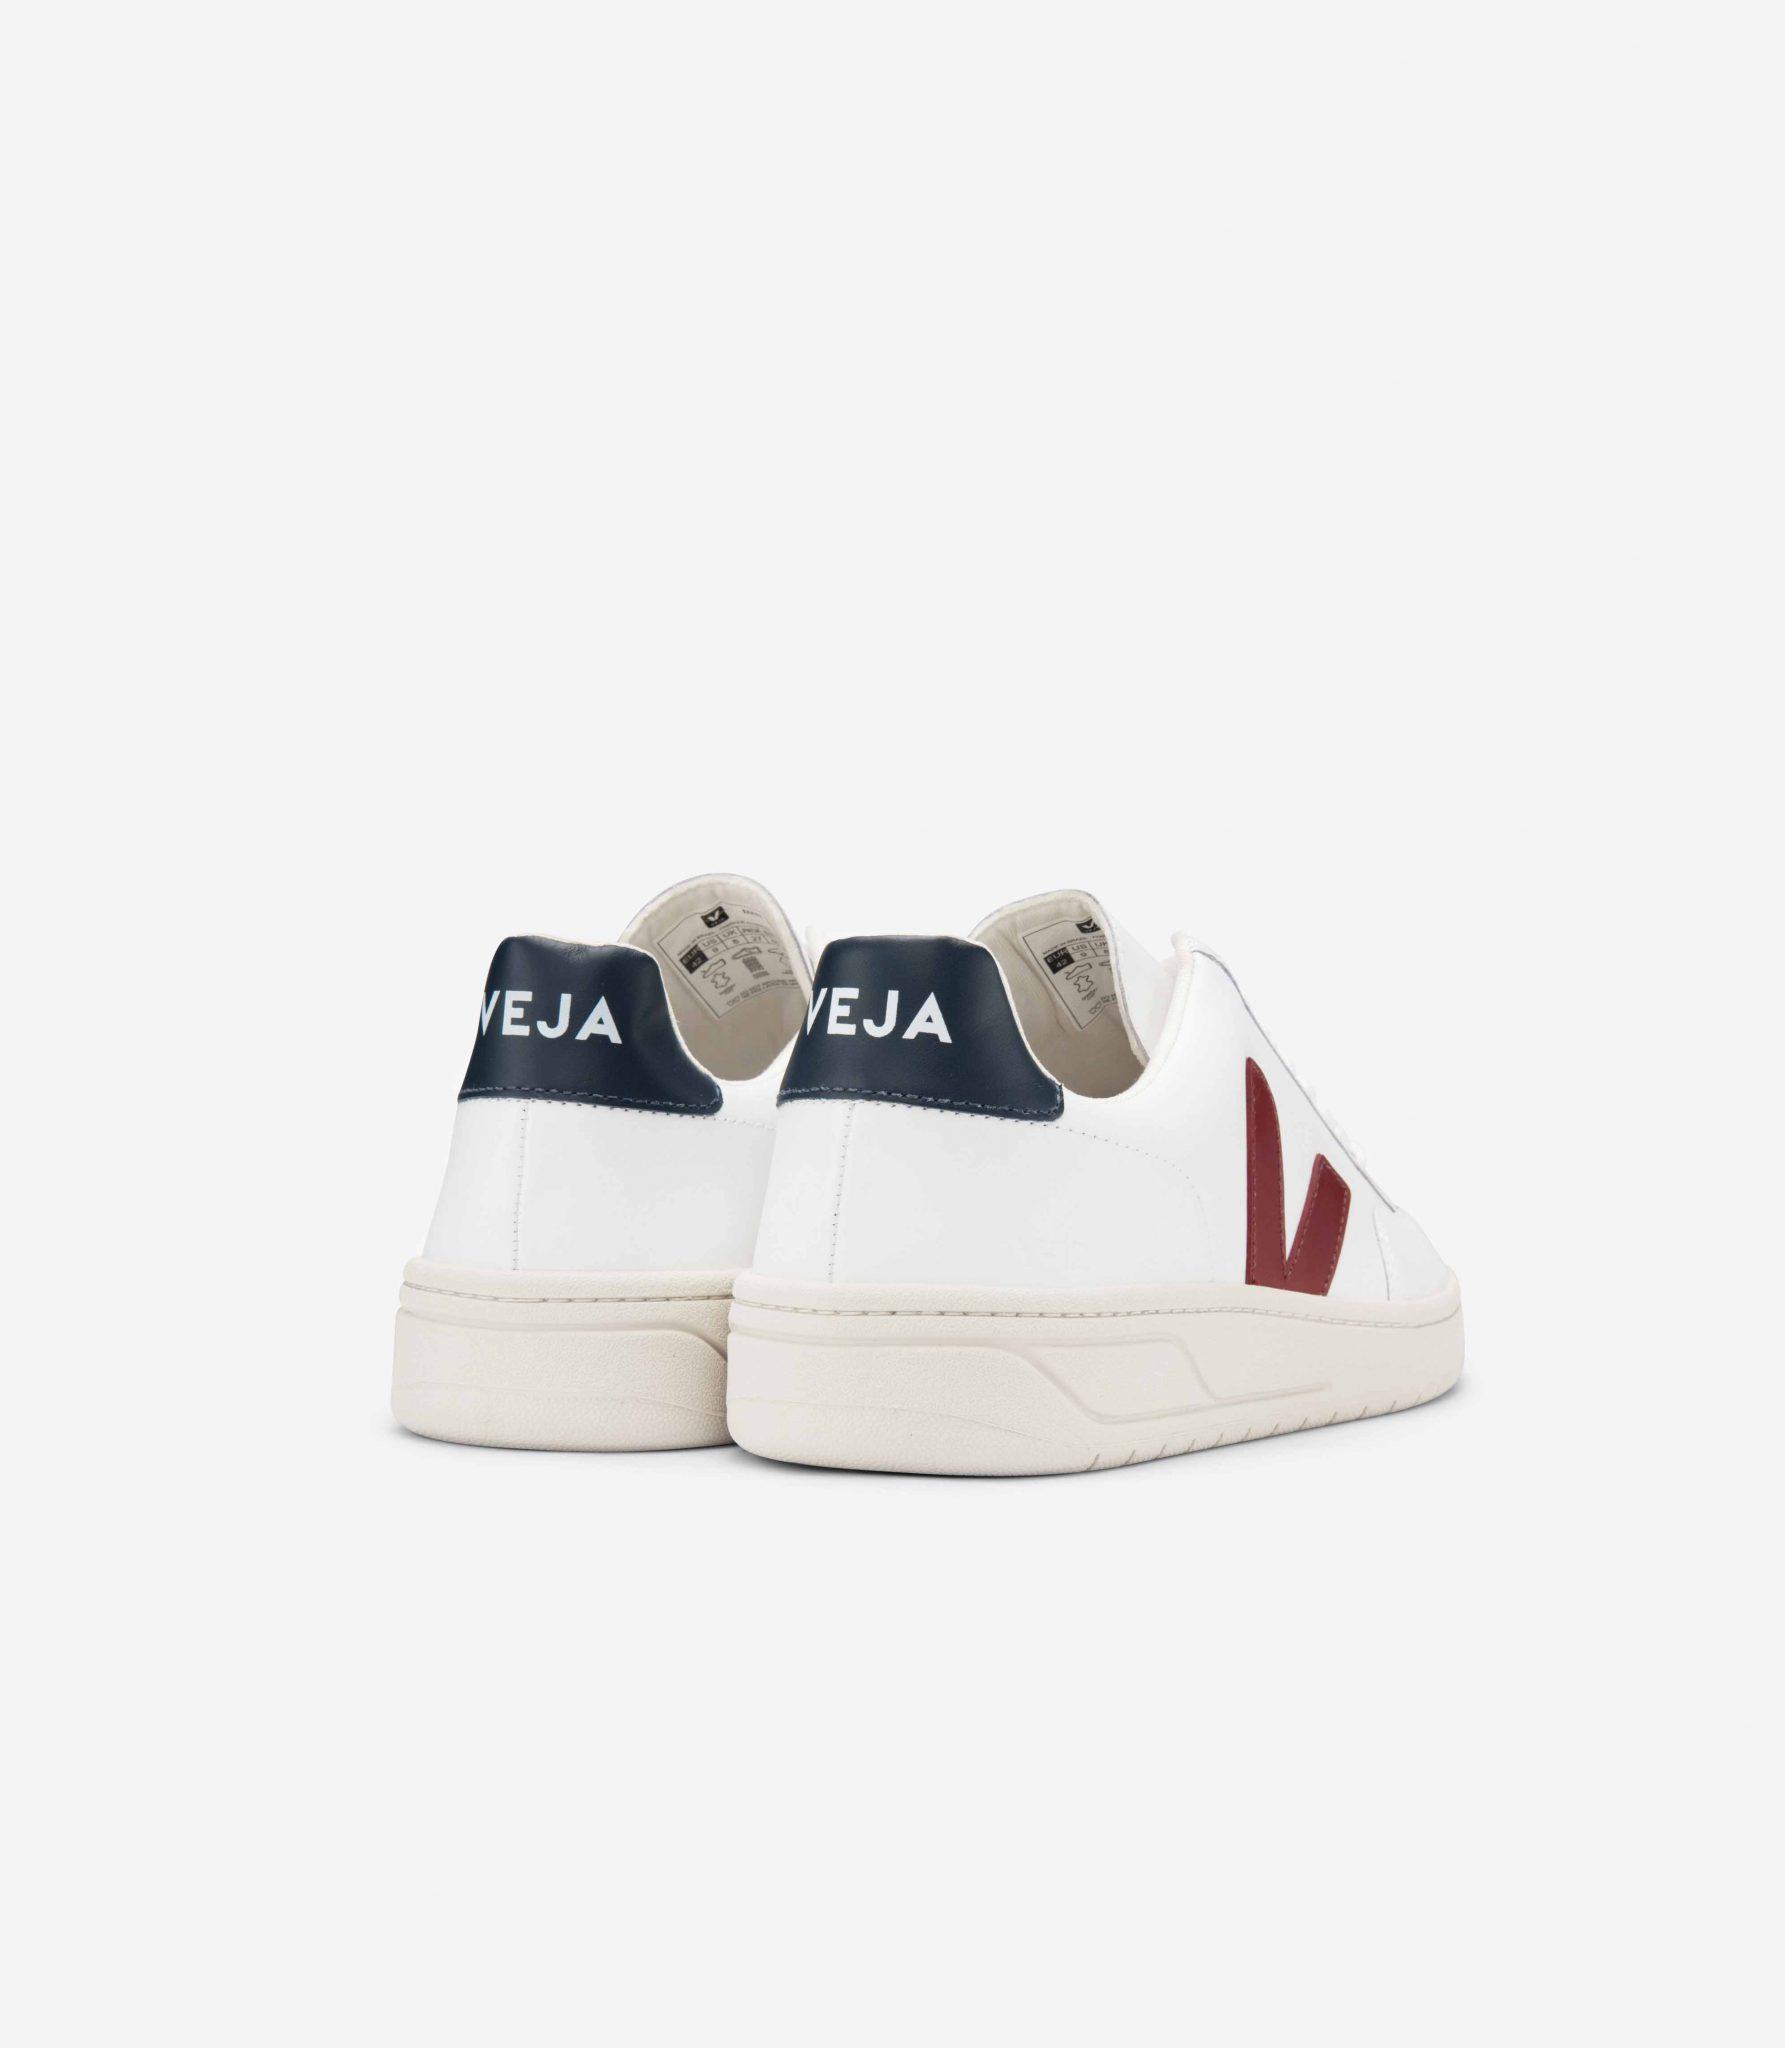 v-12-leather-extra-white-marsala-nautico (3)